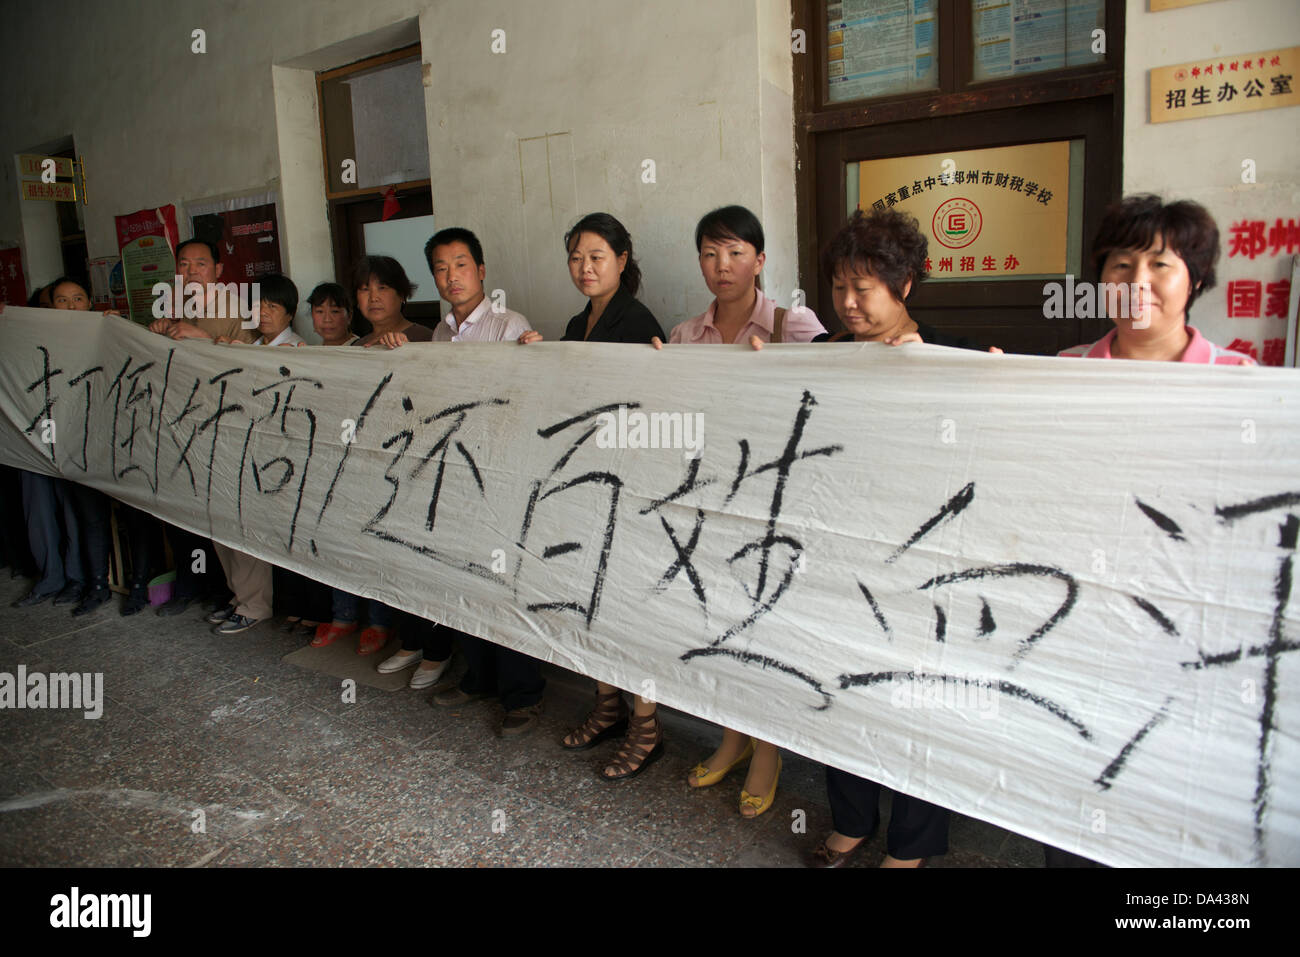 China Anyang illegal fund-raising. 2013 - Stock Image